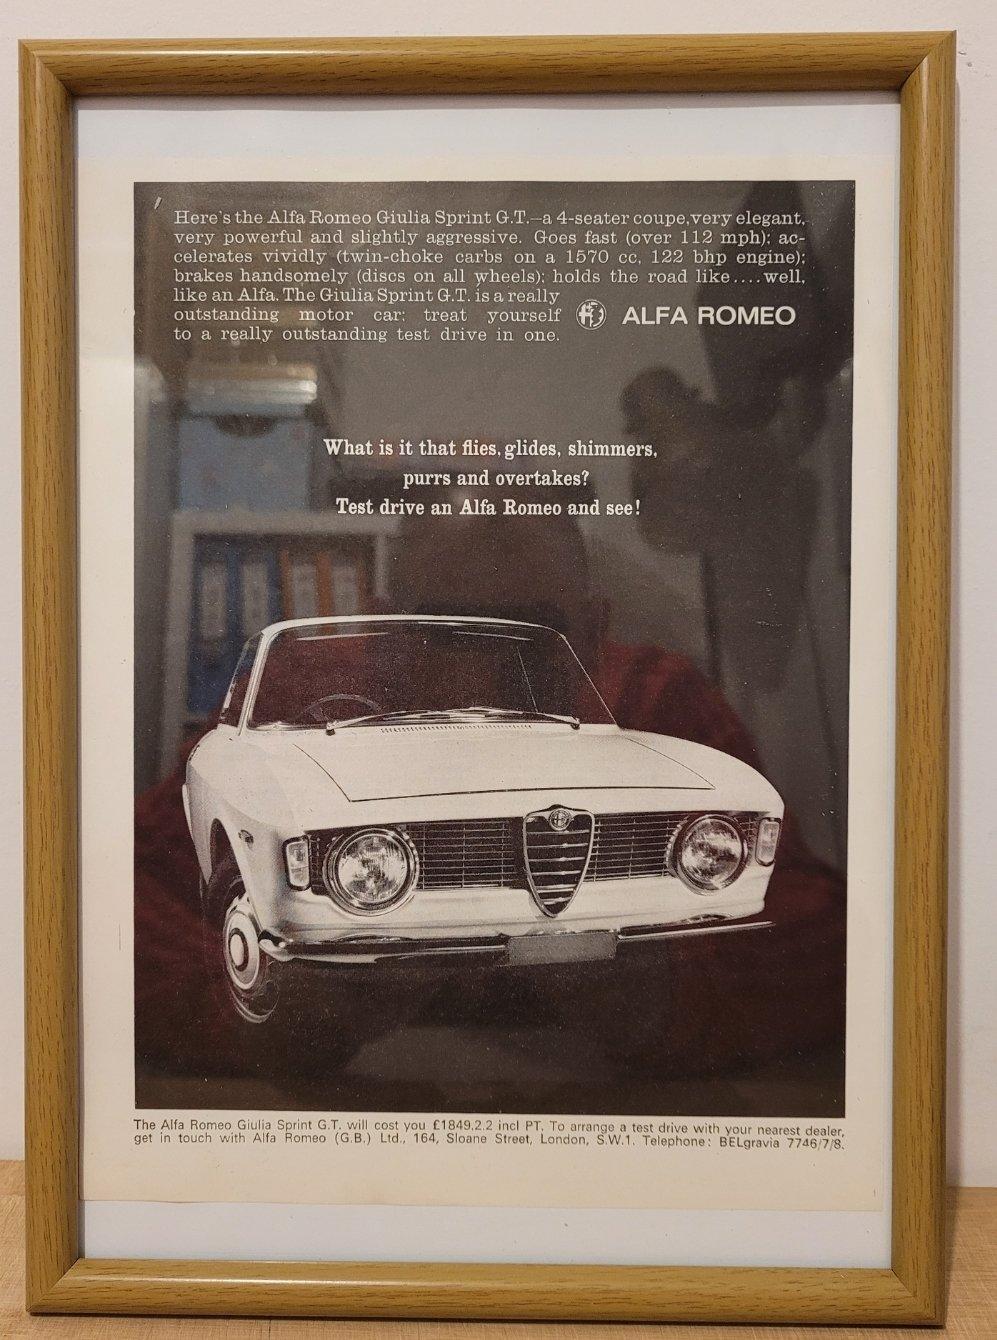 Picture of 1963 Original 1965 Alfa Romeo Giulia Sprint Framed Advert For Sale